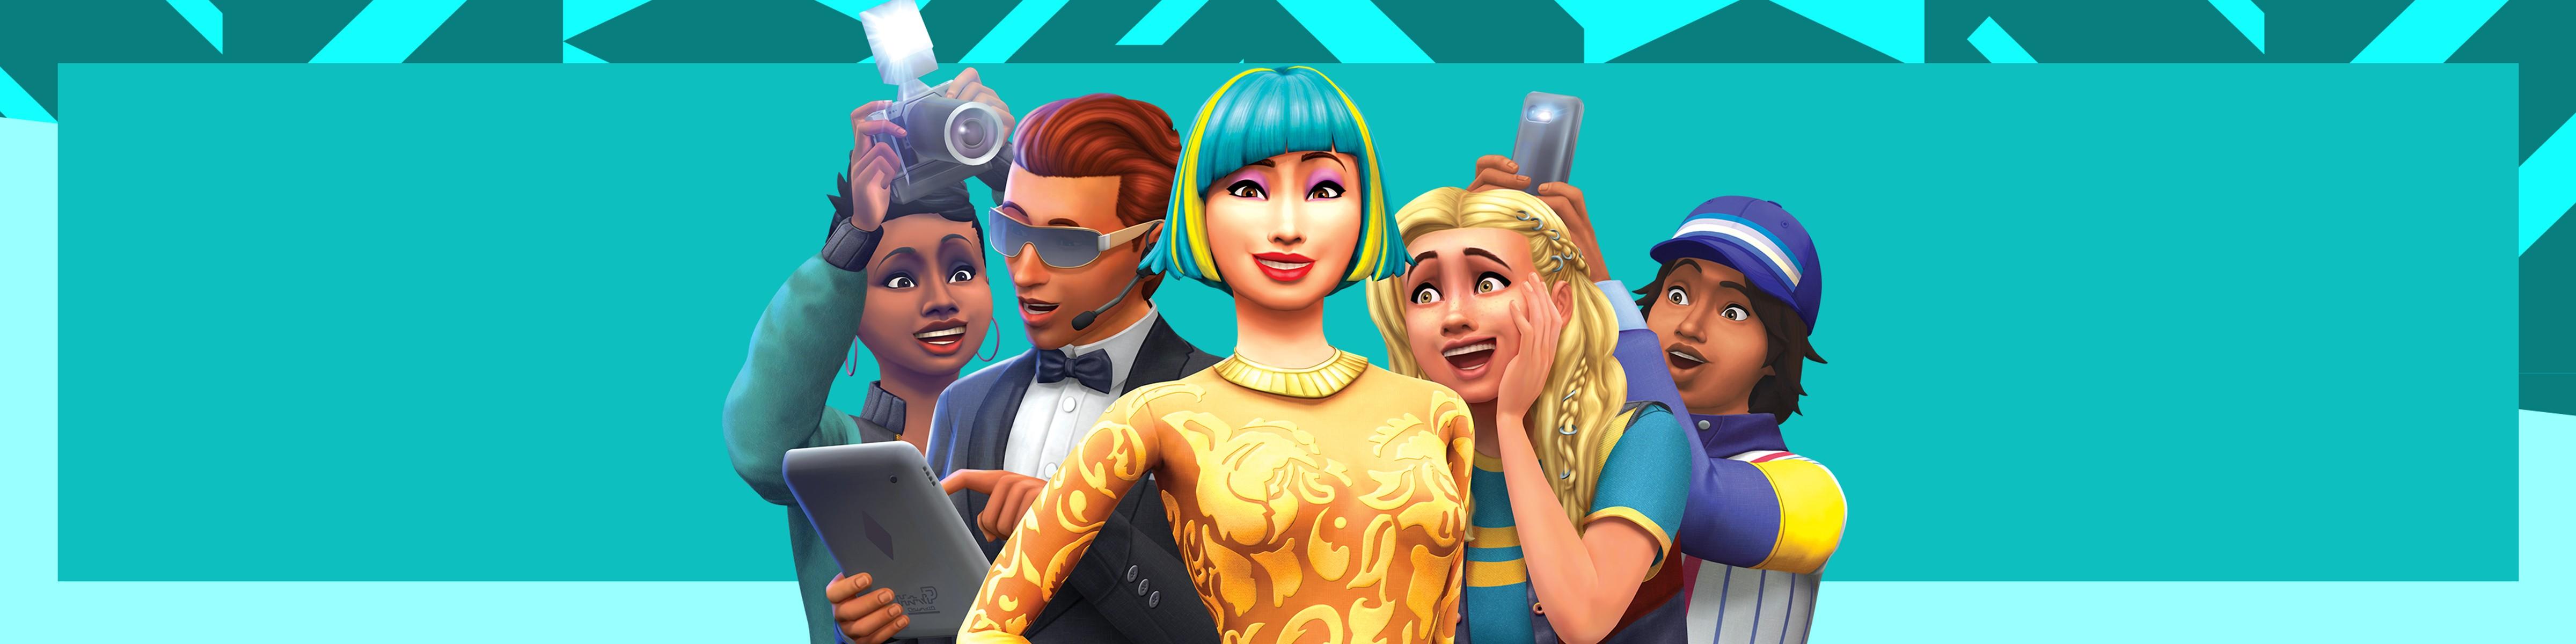 berömda dating Sims